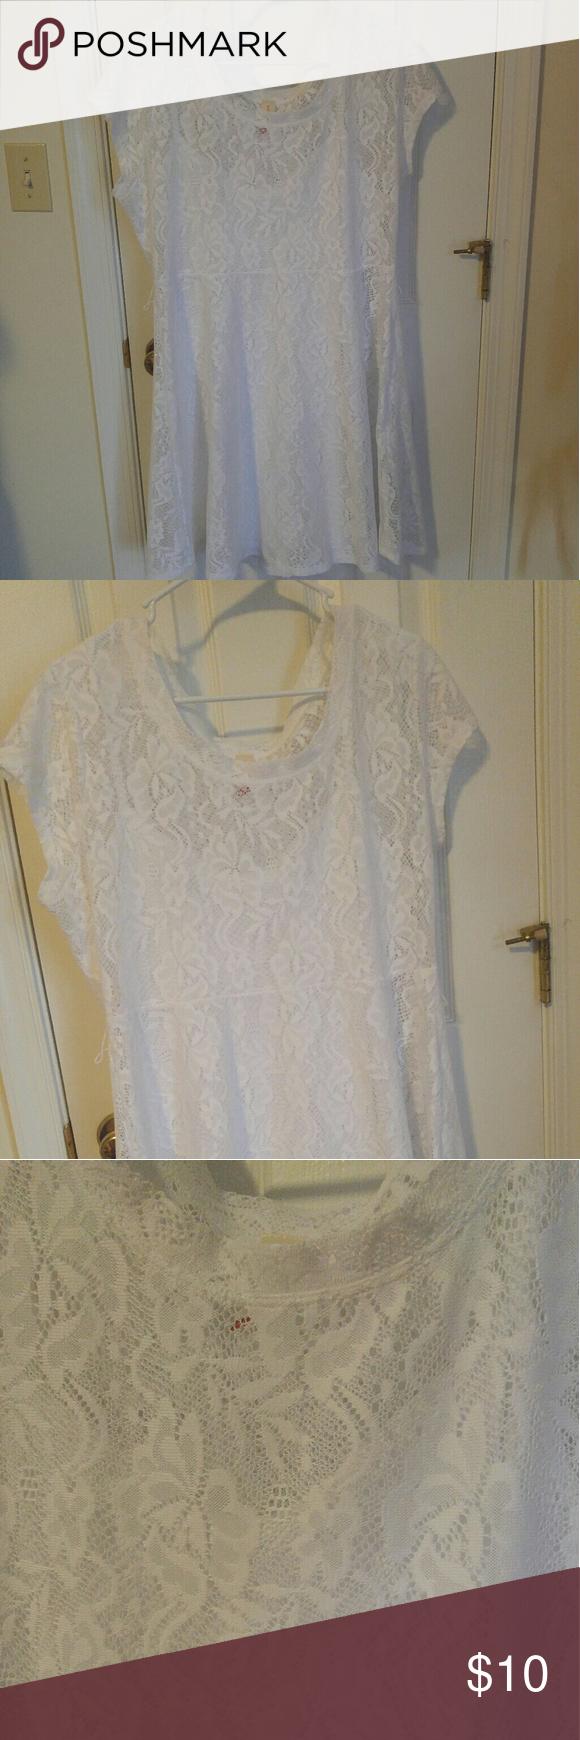 White short sleeve lace dress White short sleeve lace dress. Slip underneath. Side zipper. No Boundaries Dresses